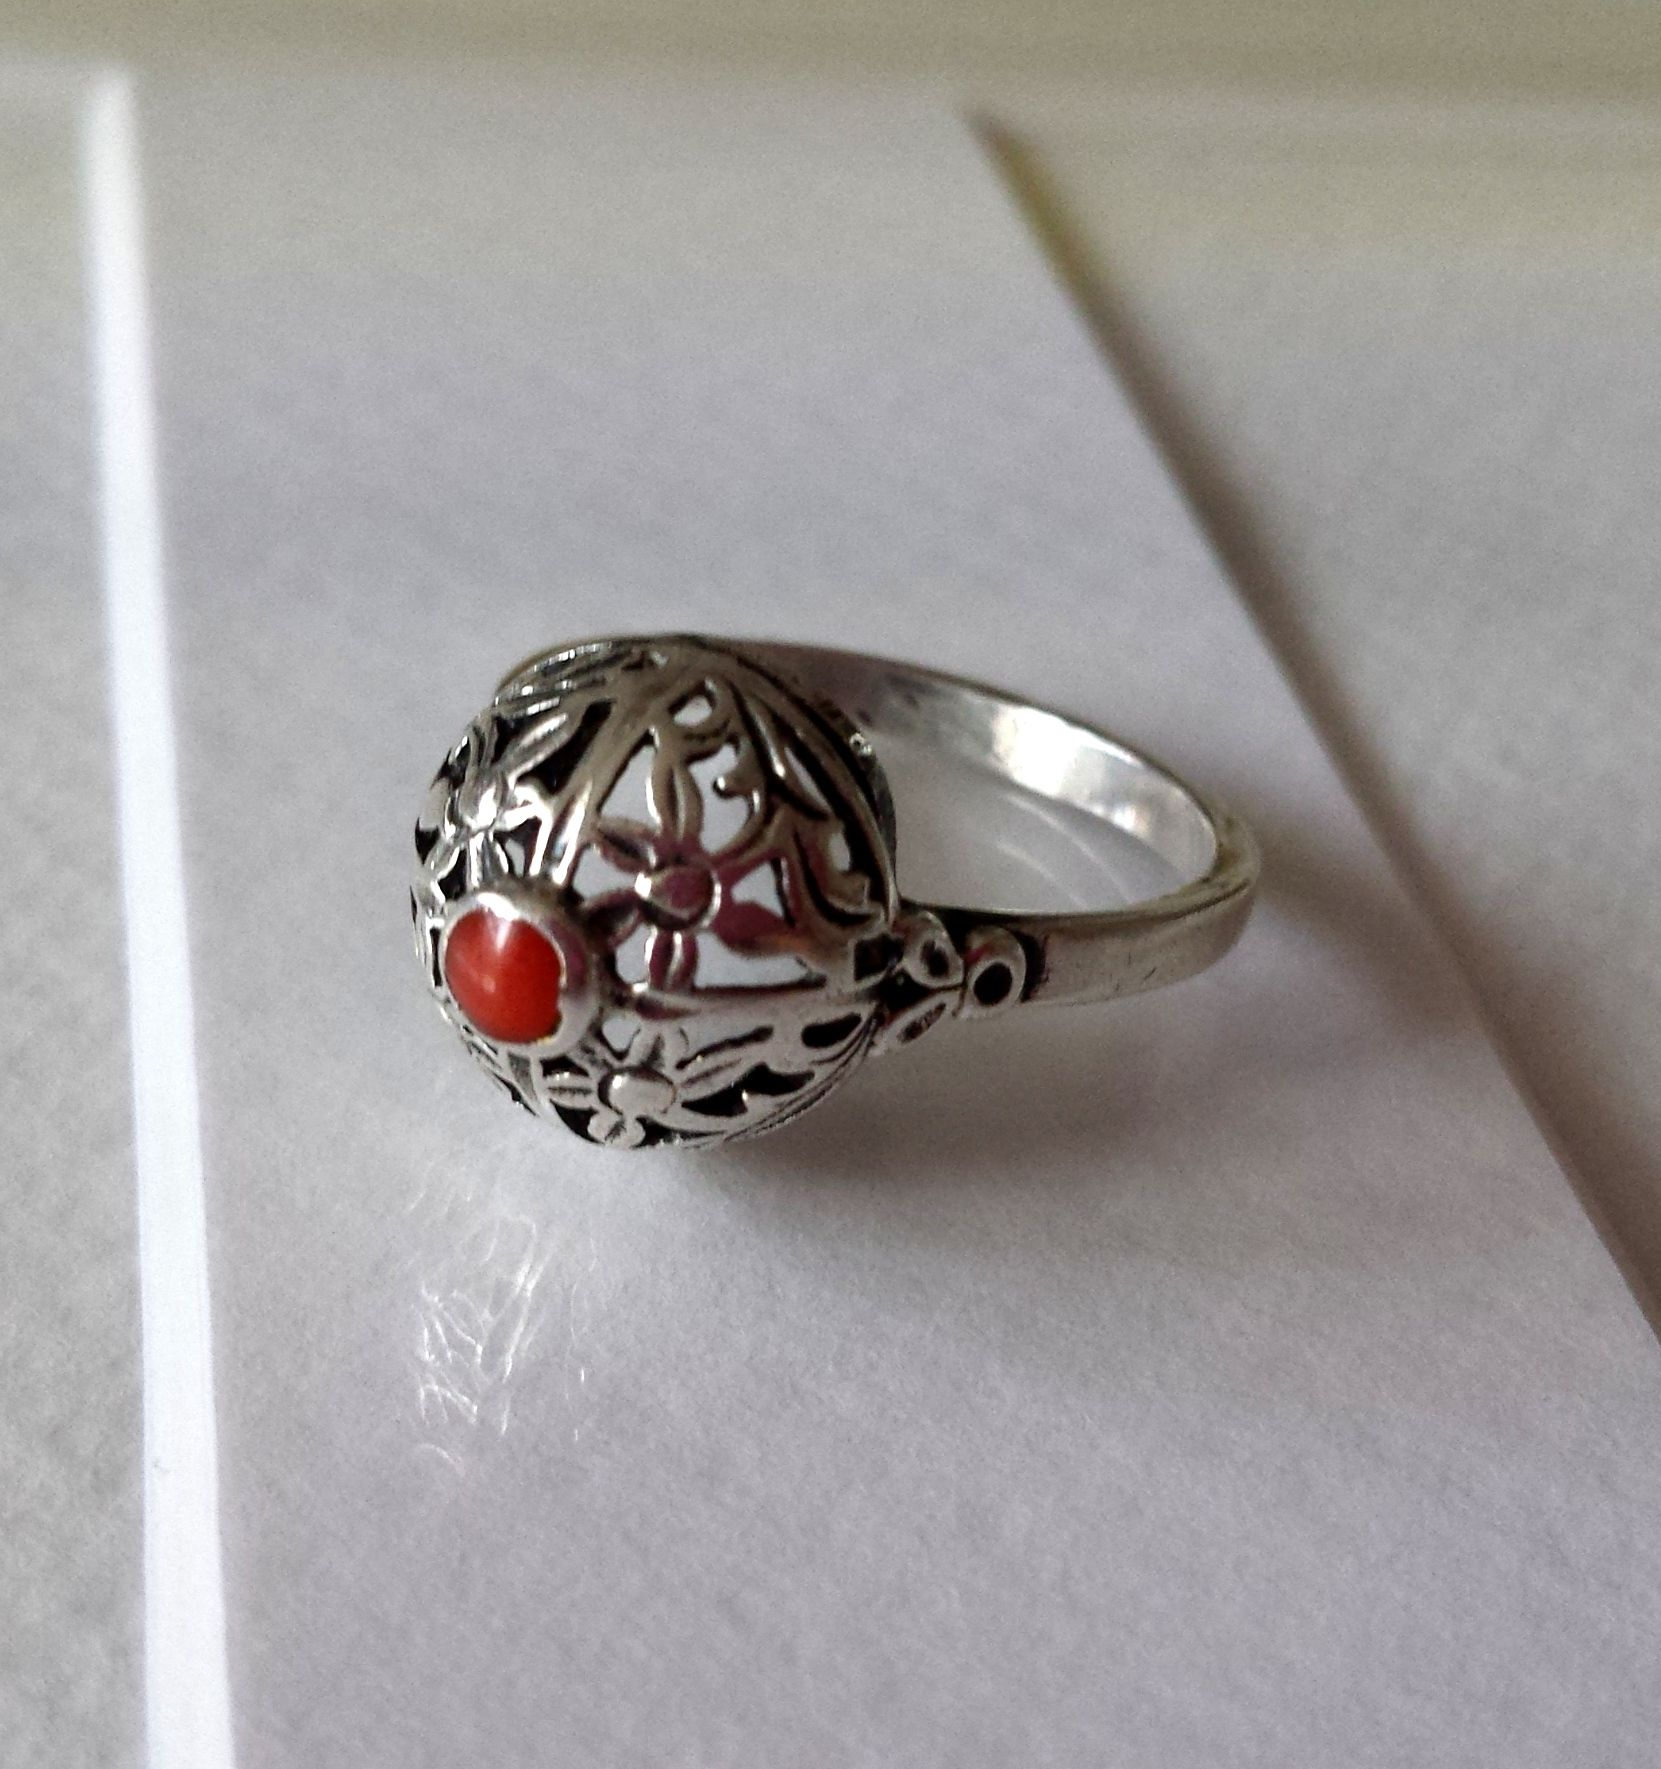 Pierscionek Warmet Vintage Lata 60 Srebro Koral 7173710264 Oficjalne Archiwum Allegro Jewelry Design Polish Jewelry Silver Jewerly